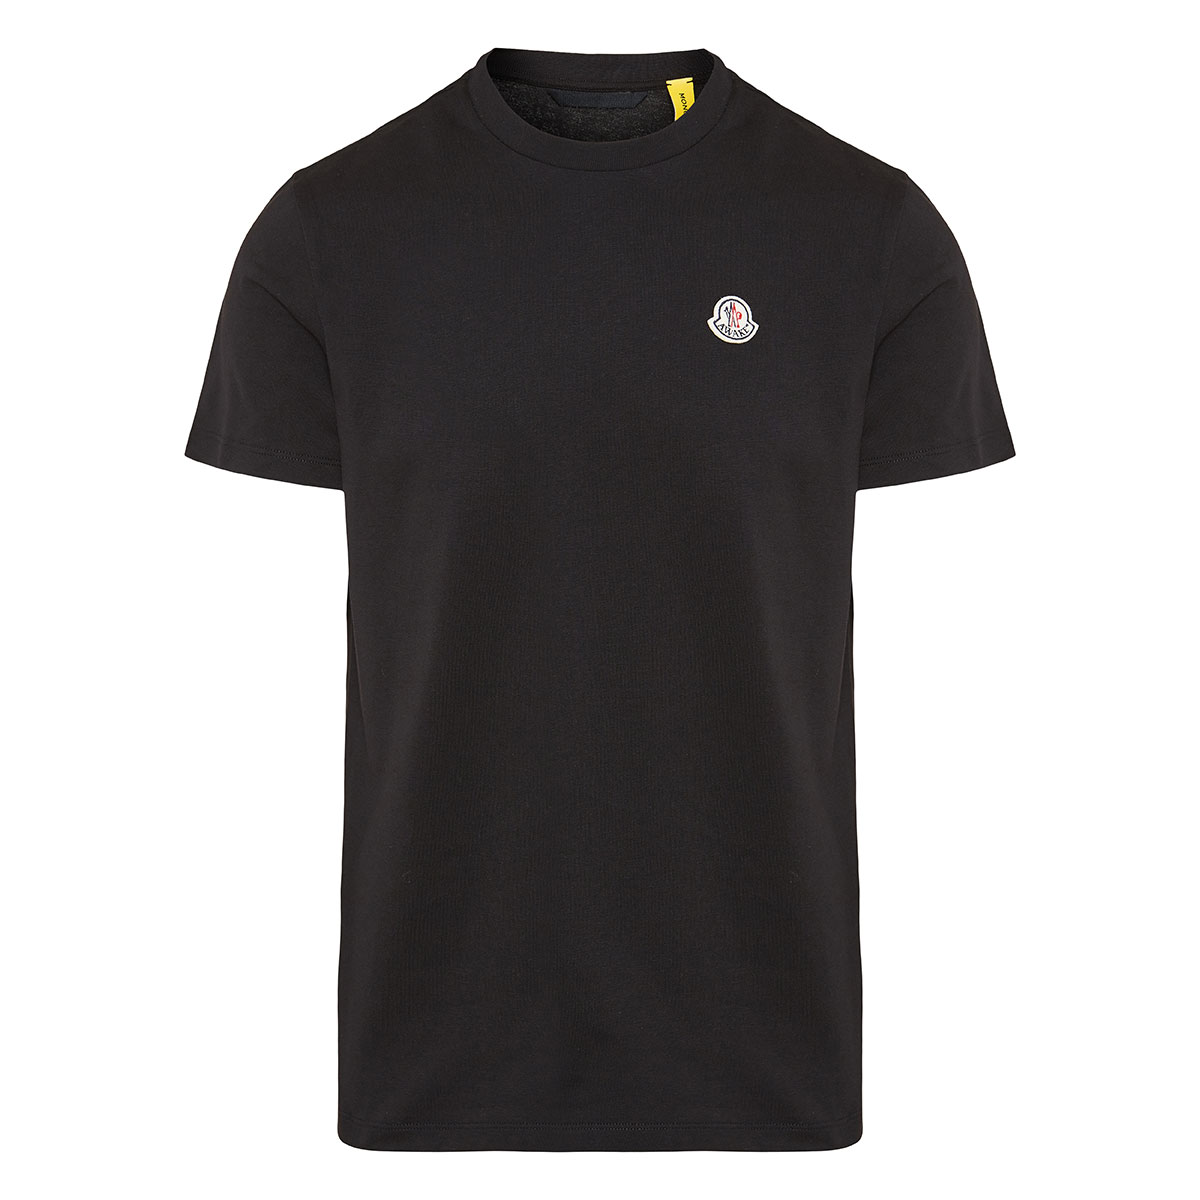 2 Moncler 1952 logo t-shirt